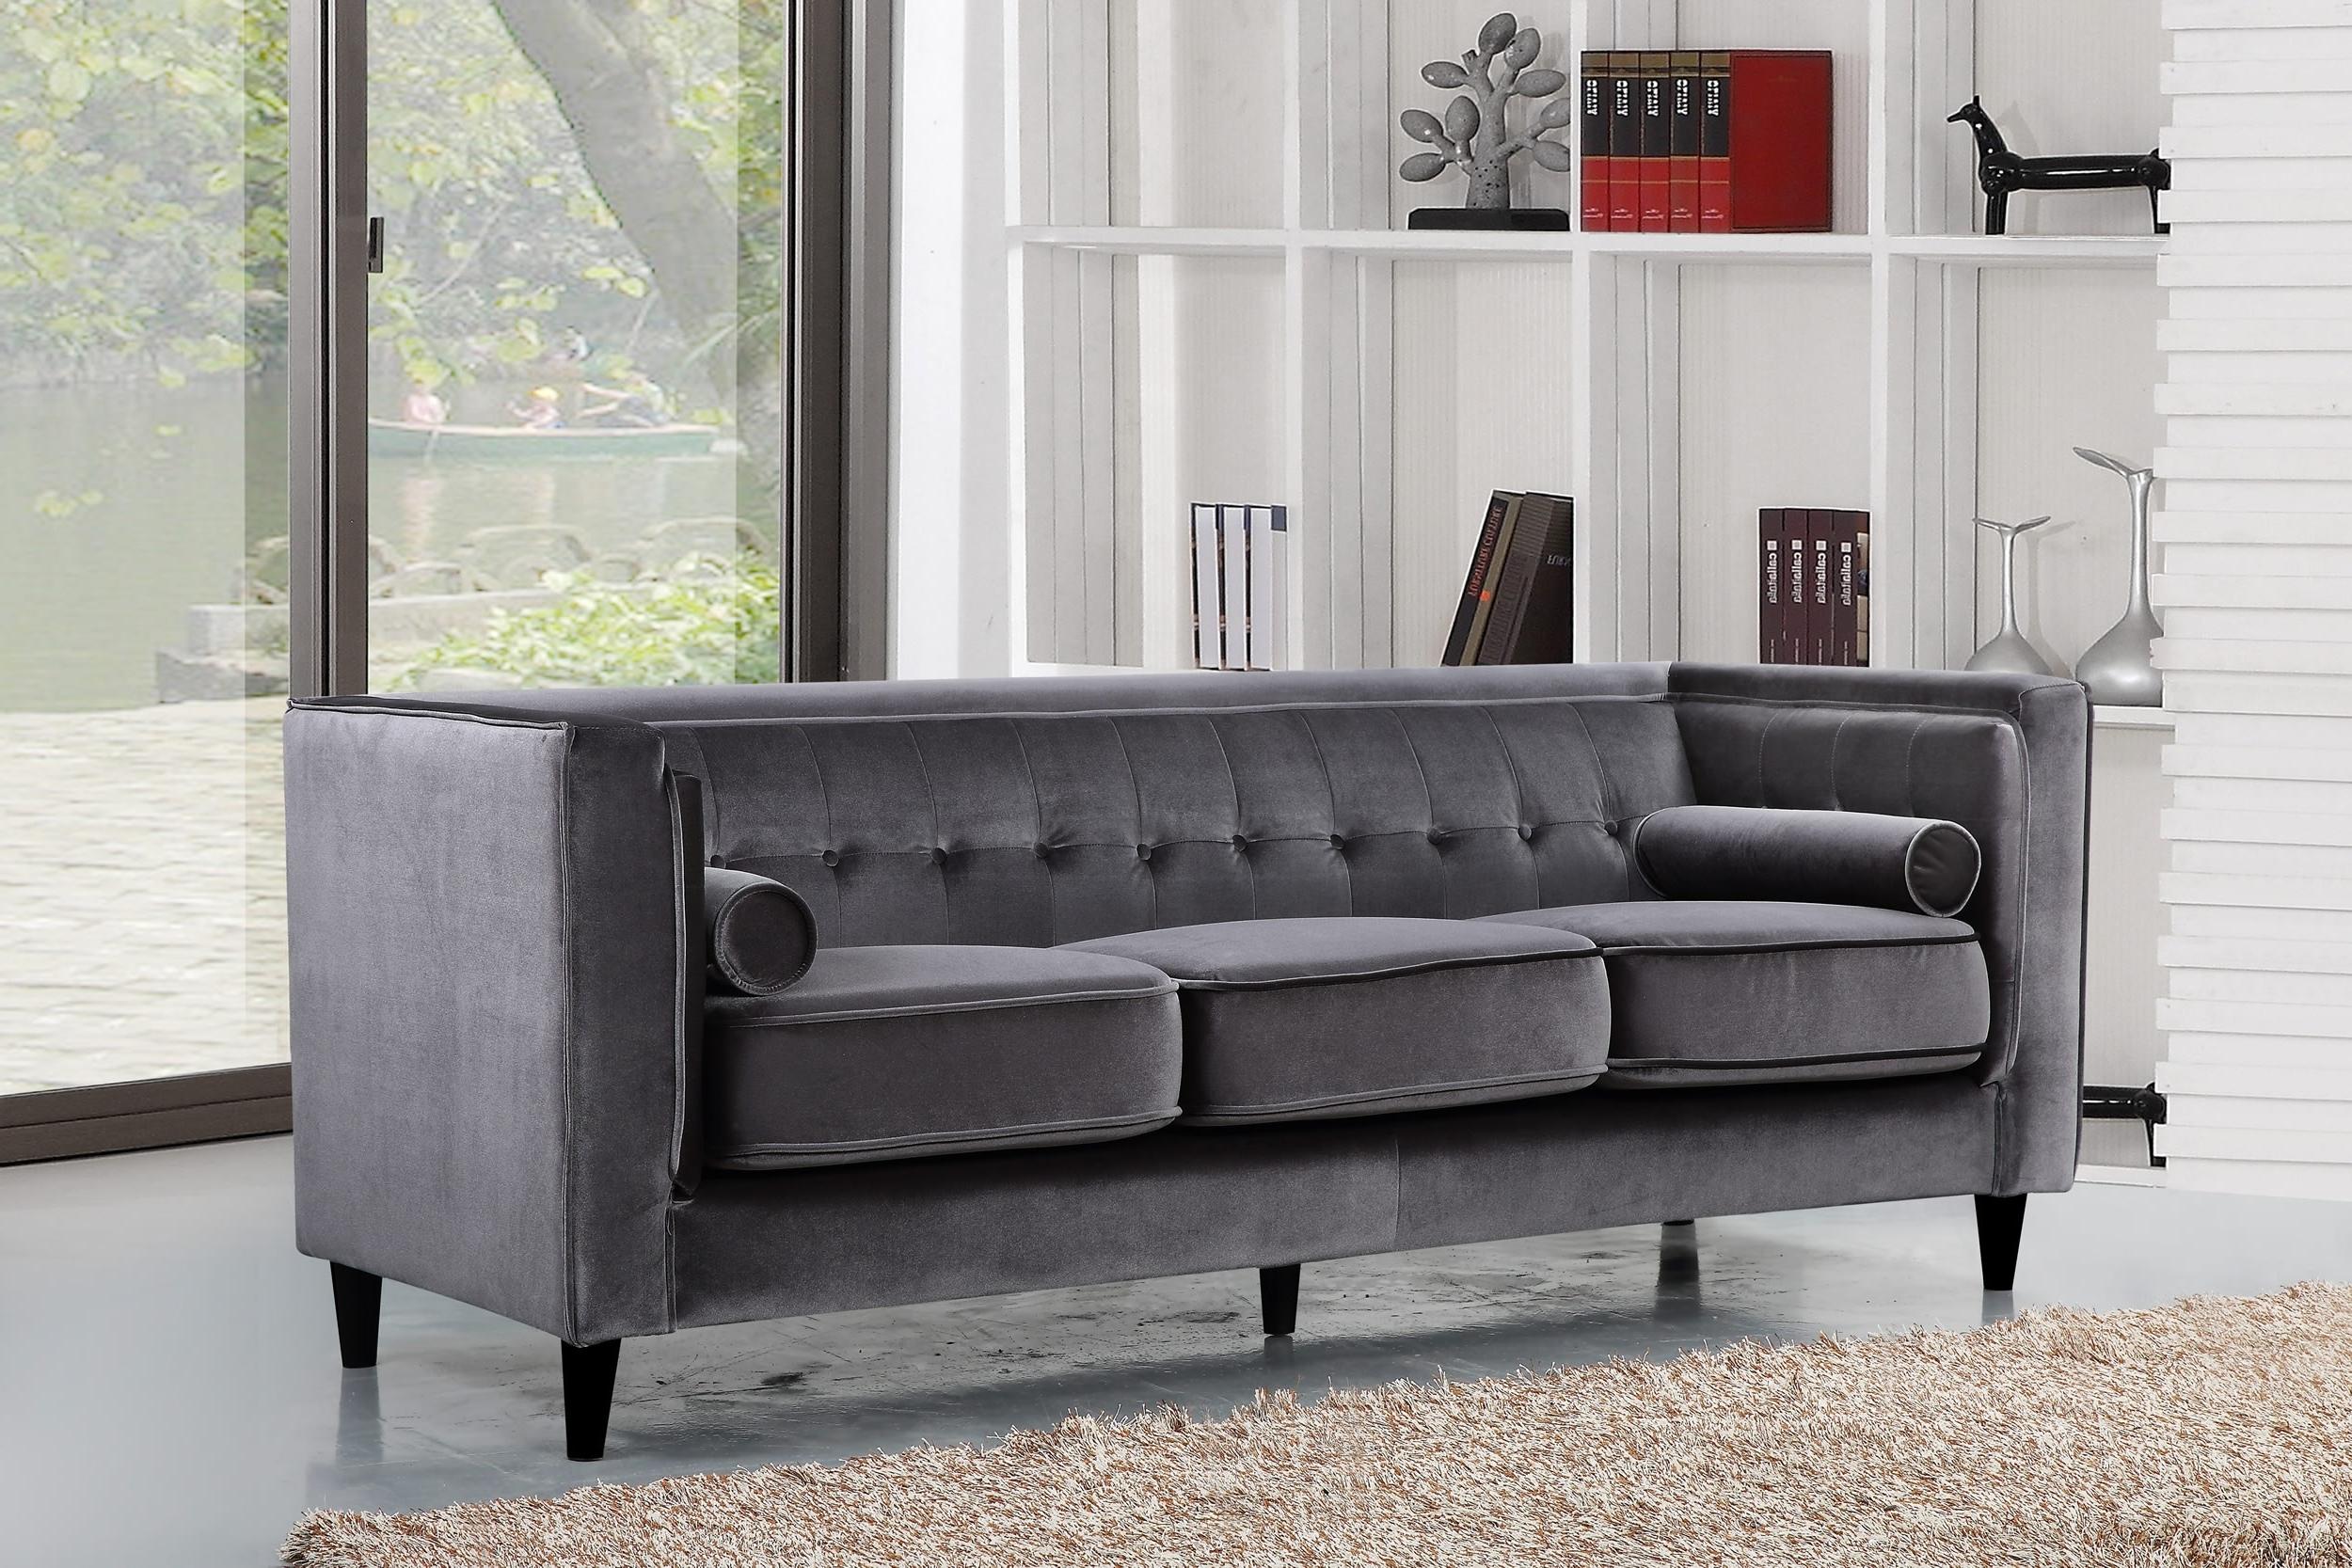 Taylor Velvet Sofa, Grey Buy Online At Best Price – Sohomod Intended For Widely Used Velvet Sofas (View 14 of 20)